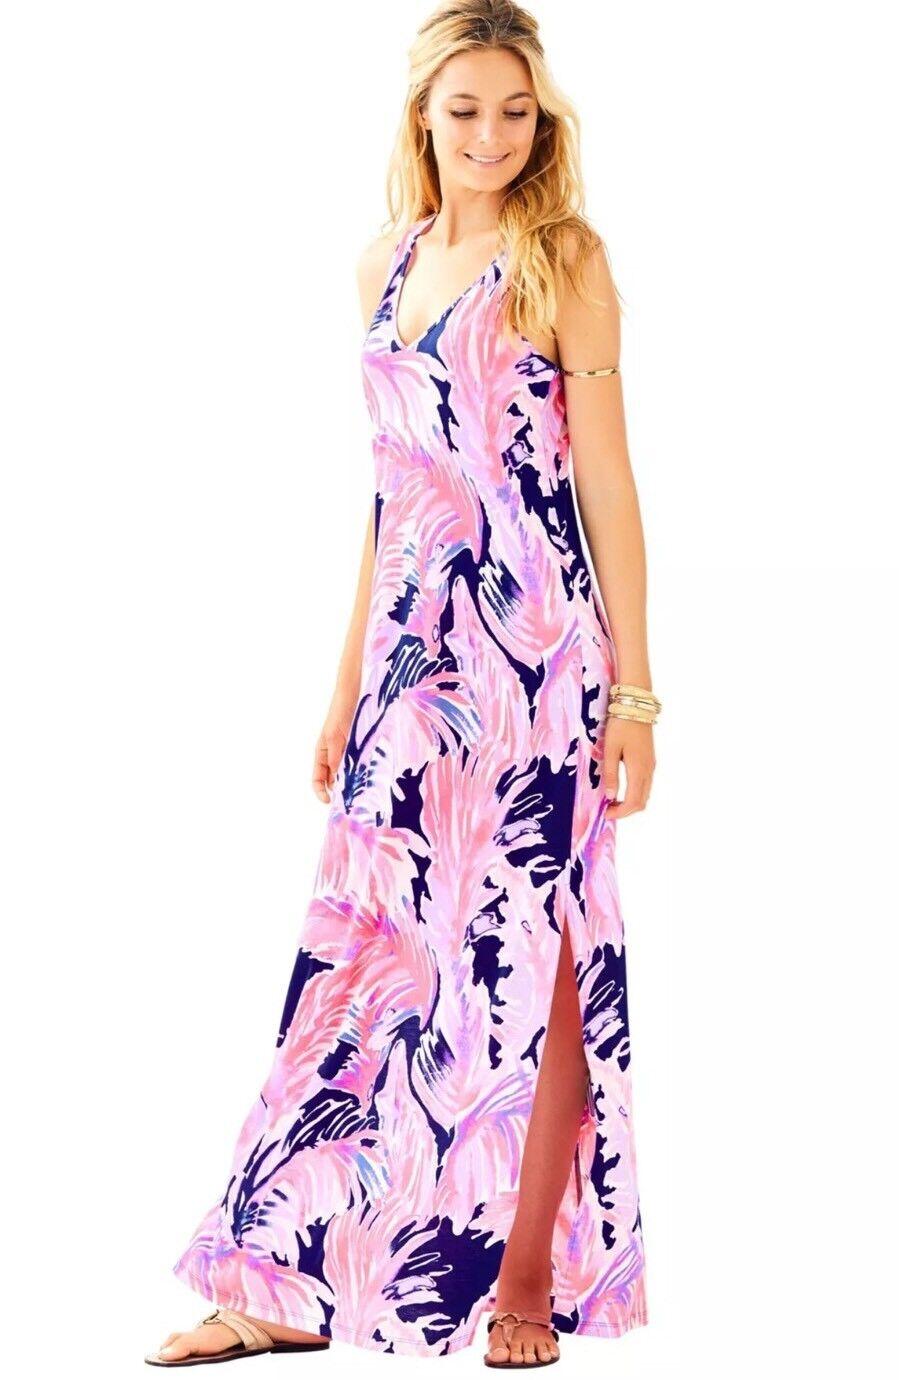 NWT Lilly Pulitzer Kerri Maxi Dress True bluee Paradise Point Reduced Small S